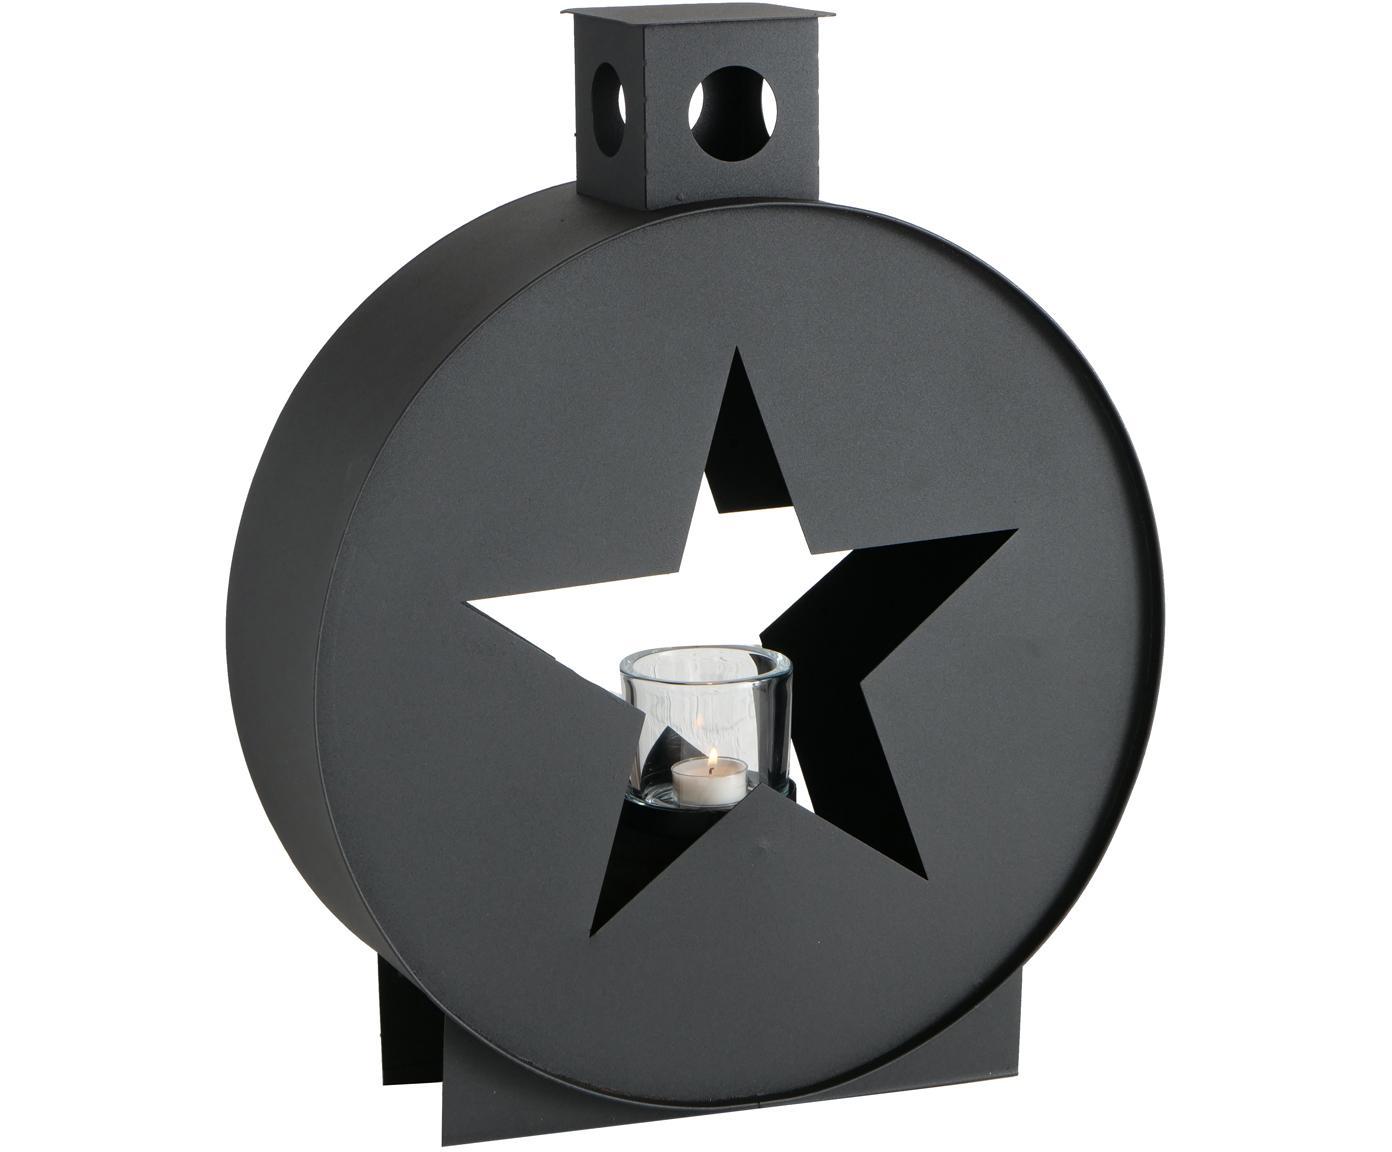 Portacandela Jolly, Portacandela: nero, Nero, Larg. 32 x Alt. 42 cm